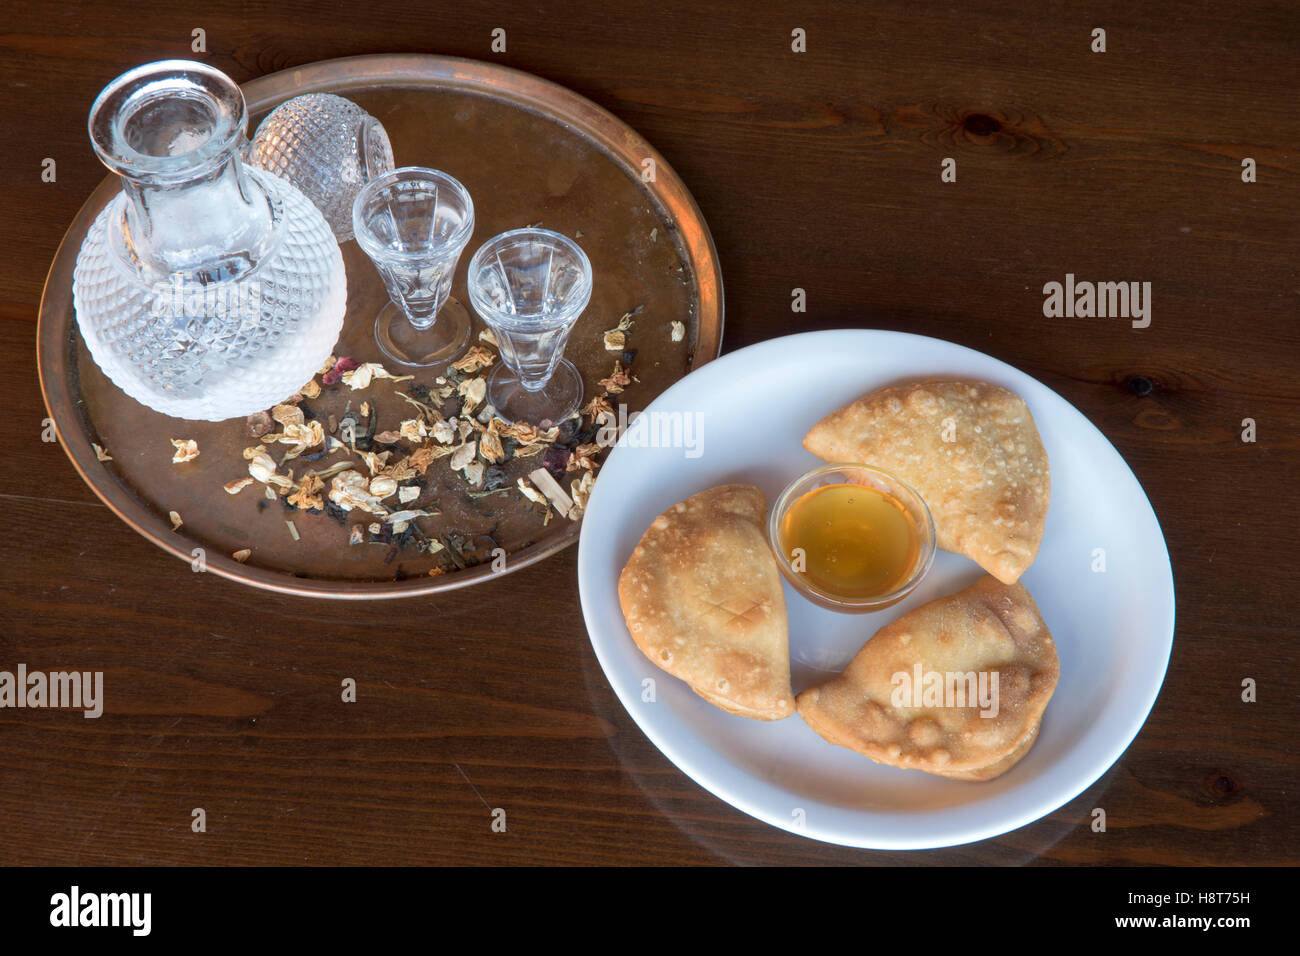 Griechenland, Kreta, griechische Küche, Lassithi-Hochebene, Taverne Vilaeti, Raki (Tsikoudia) mit Käse - Stock Image